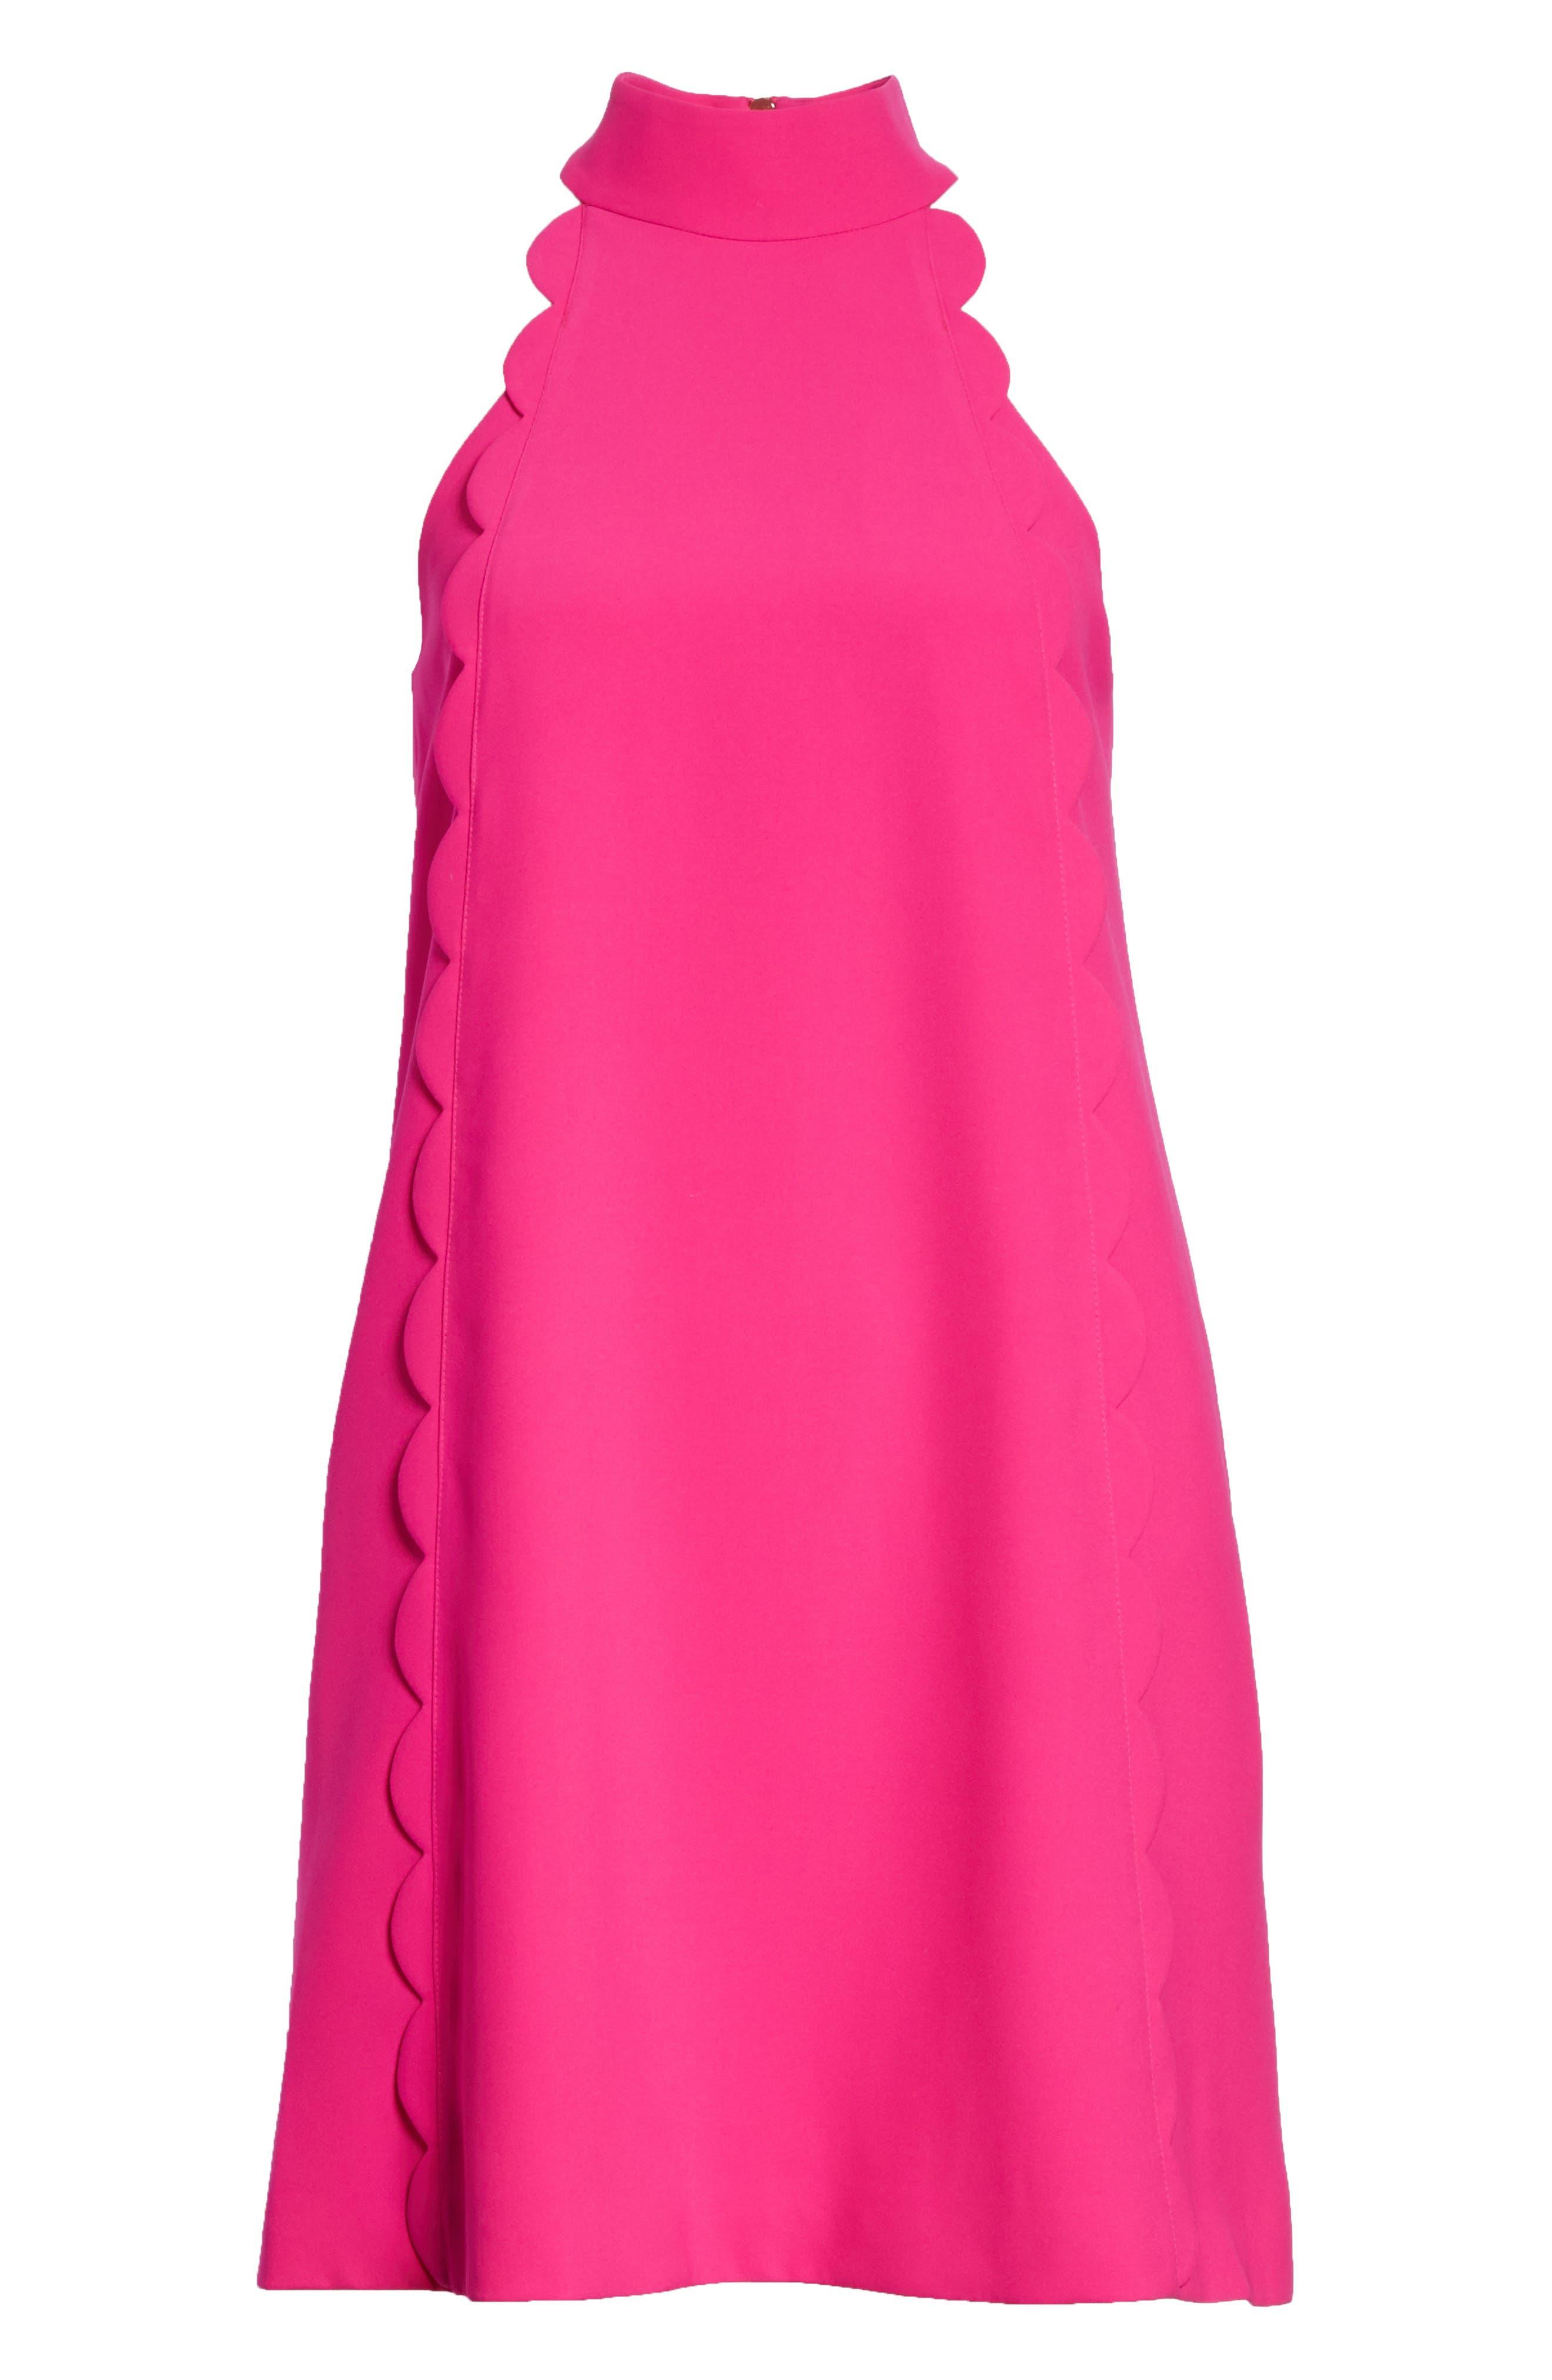 Torrii High Neck Tunic Dress,                             Alternate thumbnail 6, color,                             Bright Pink